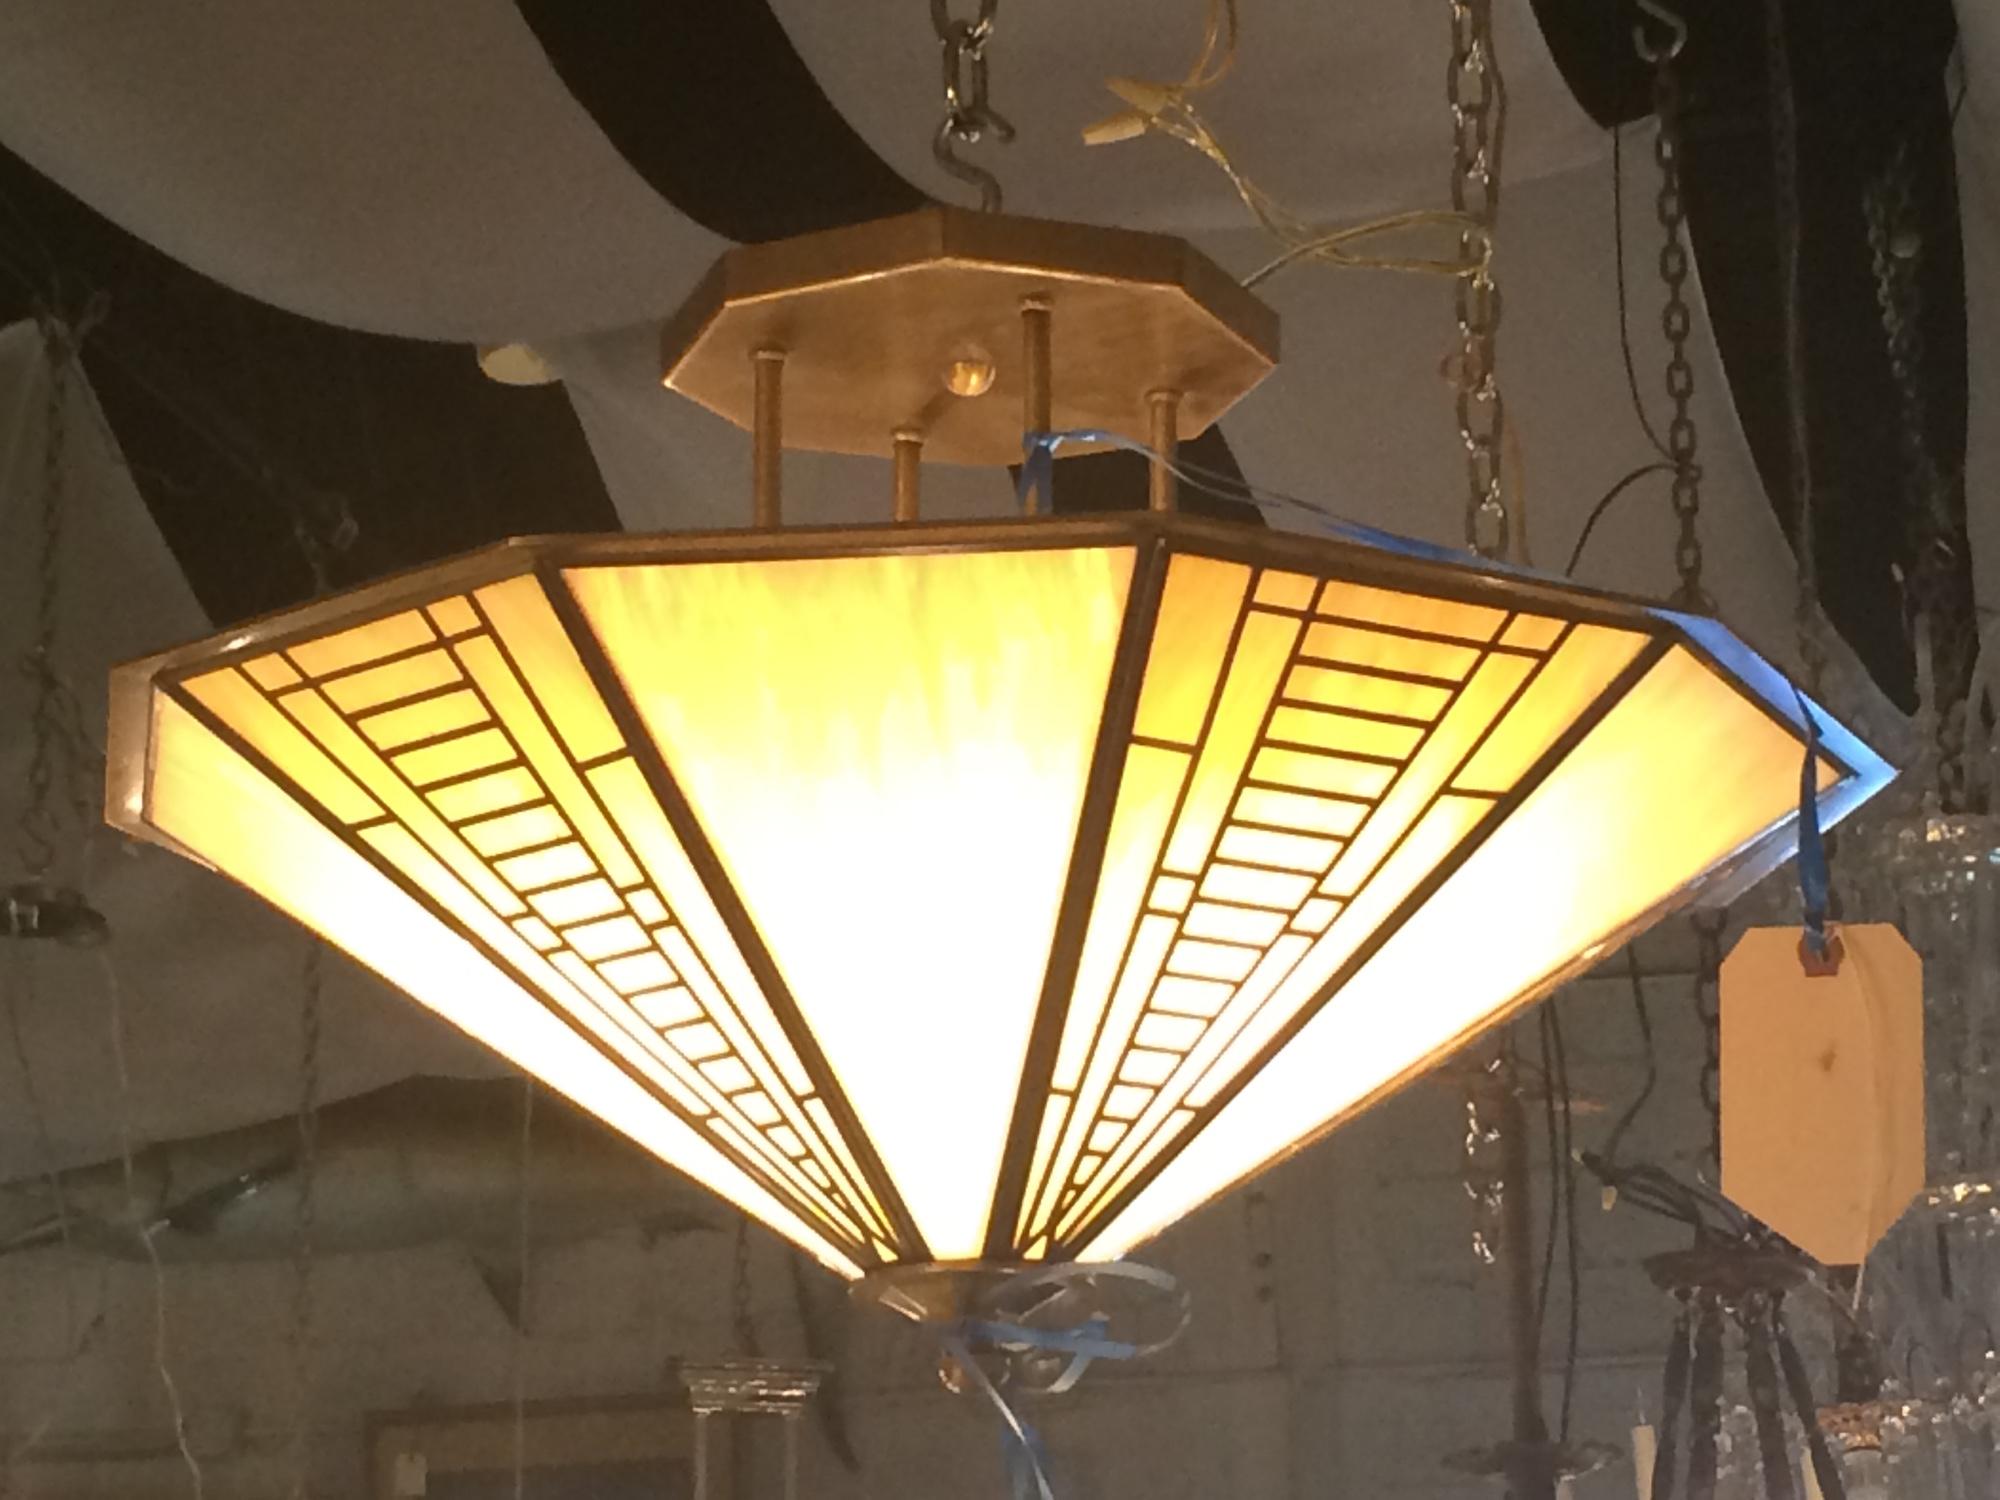 FREDRICK RAMOND Iridescent Glass Chandelier Ceiling Light